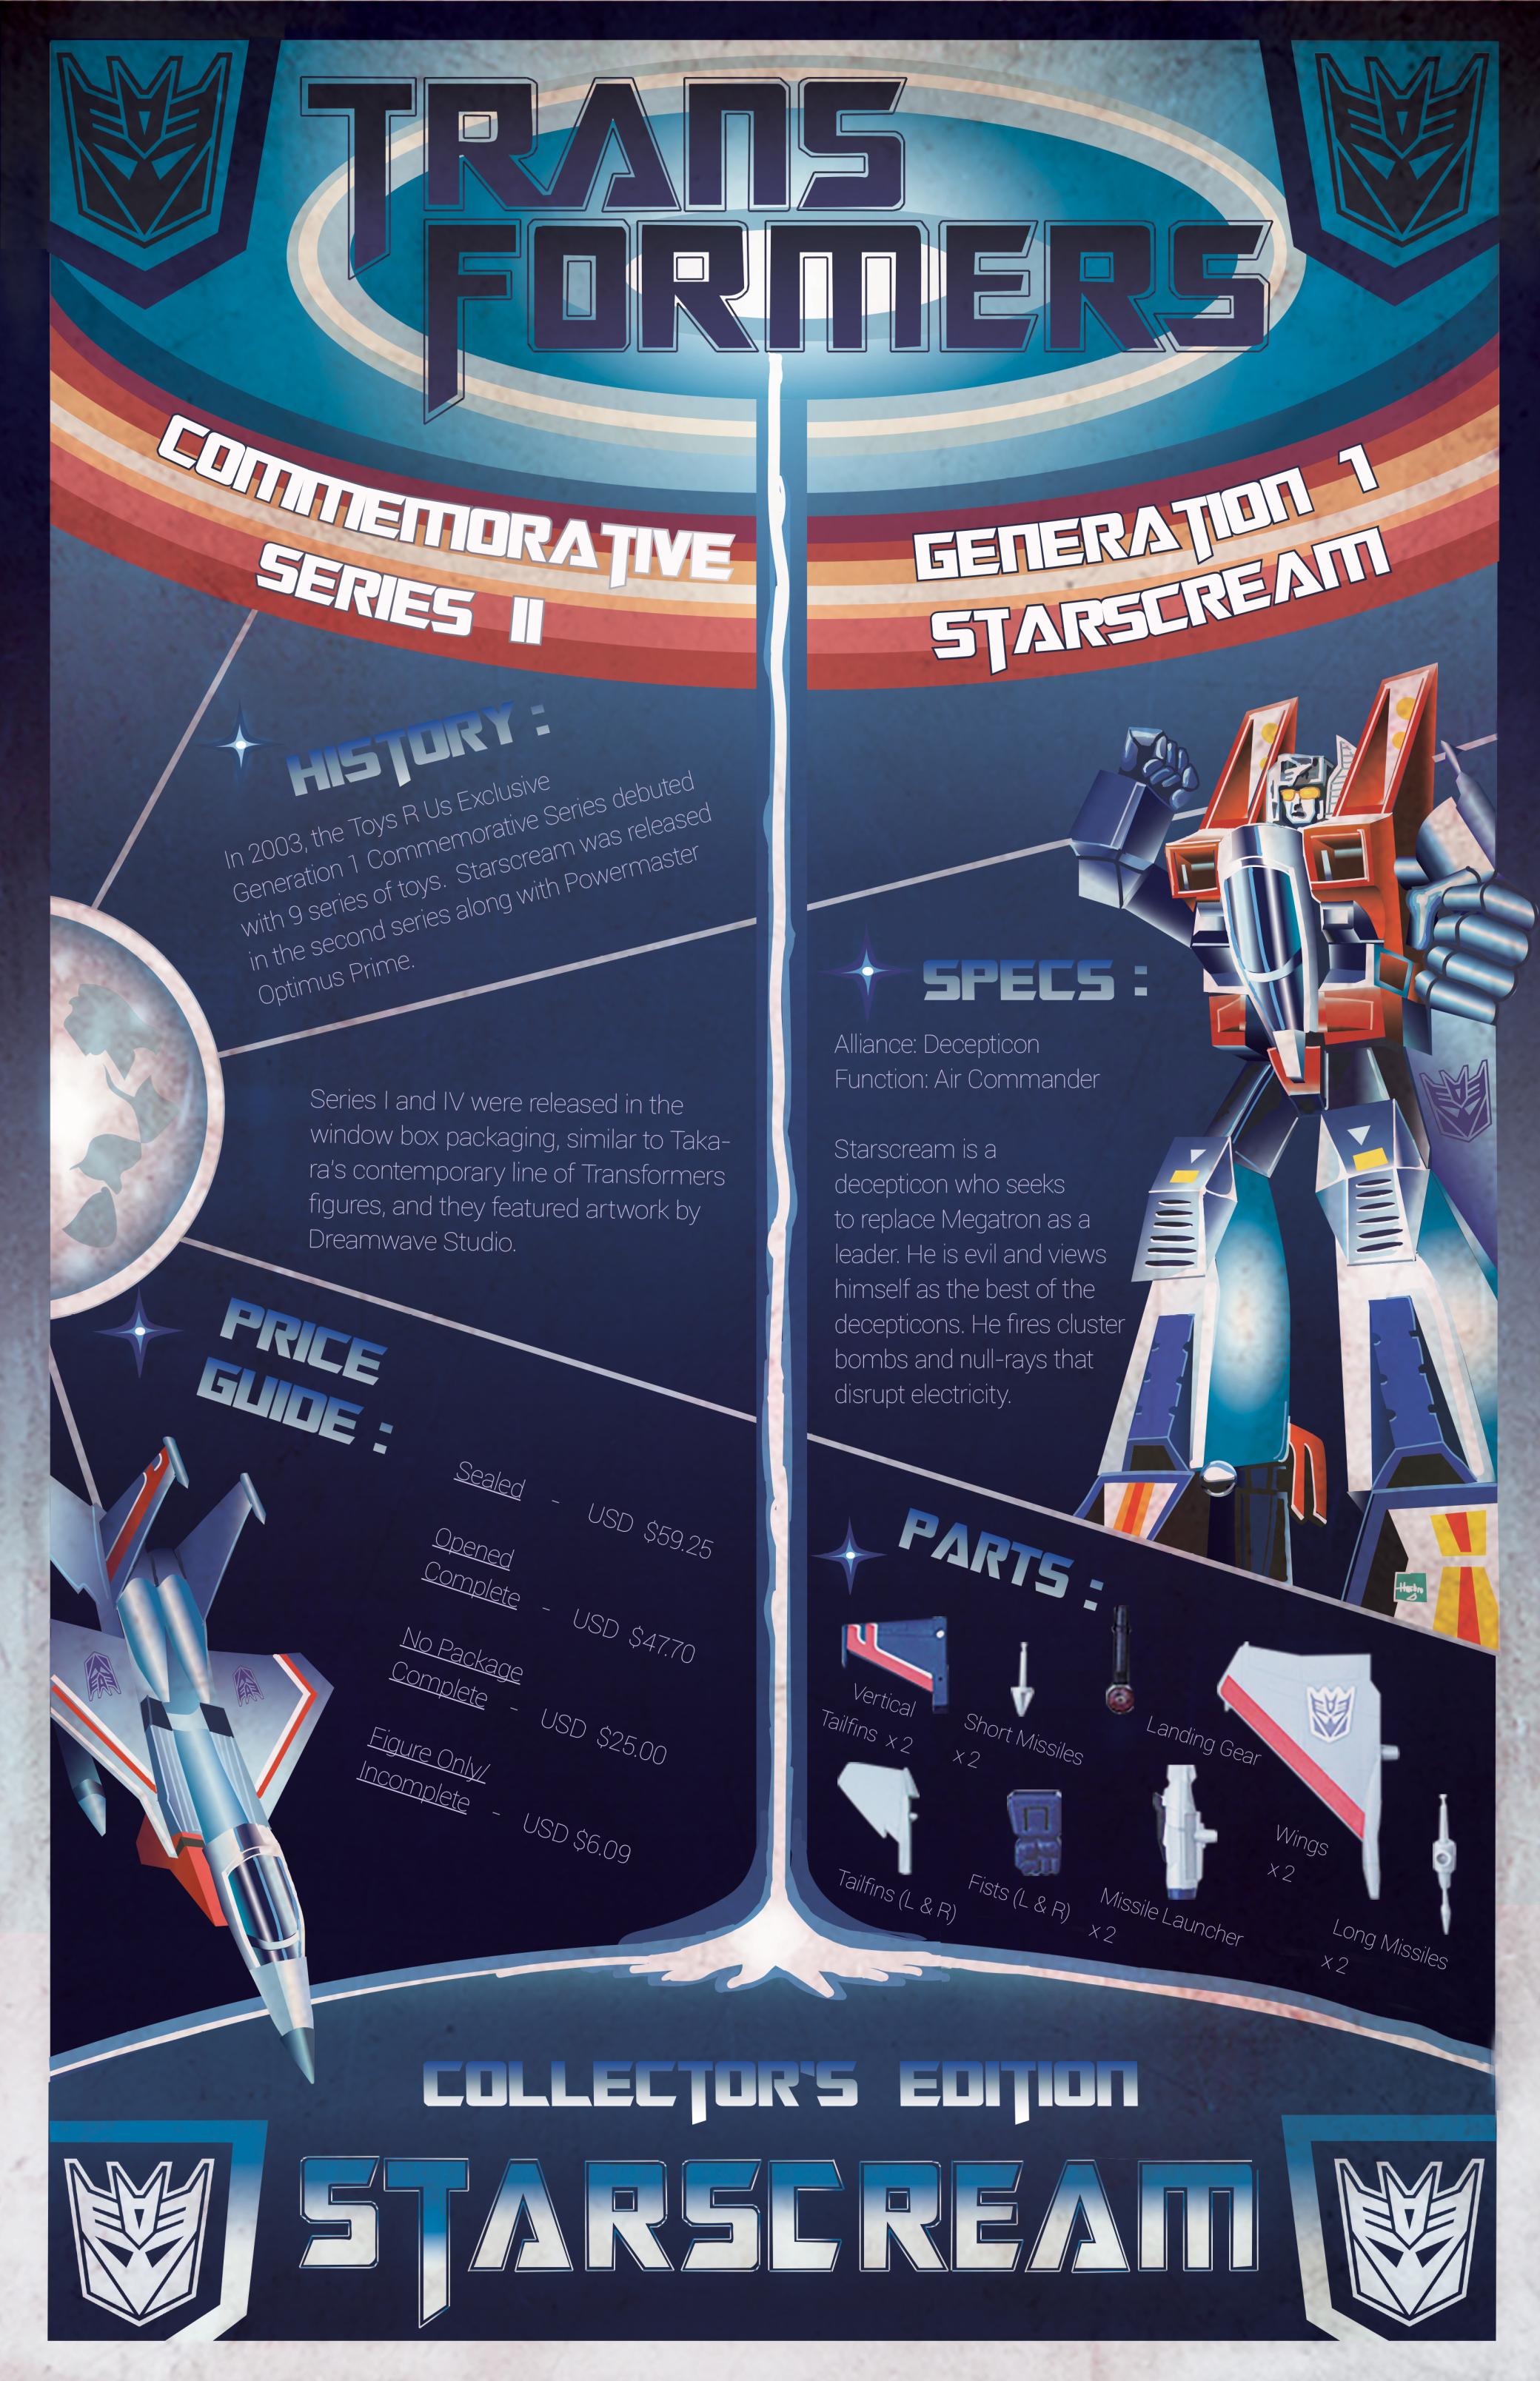 starscream-infographic-final.jpg